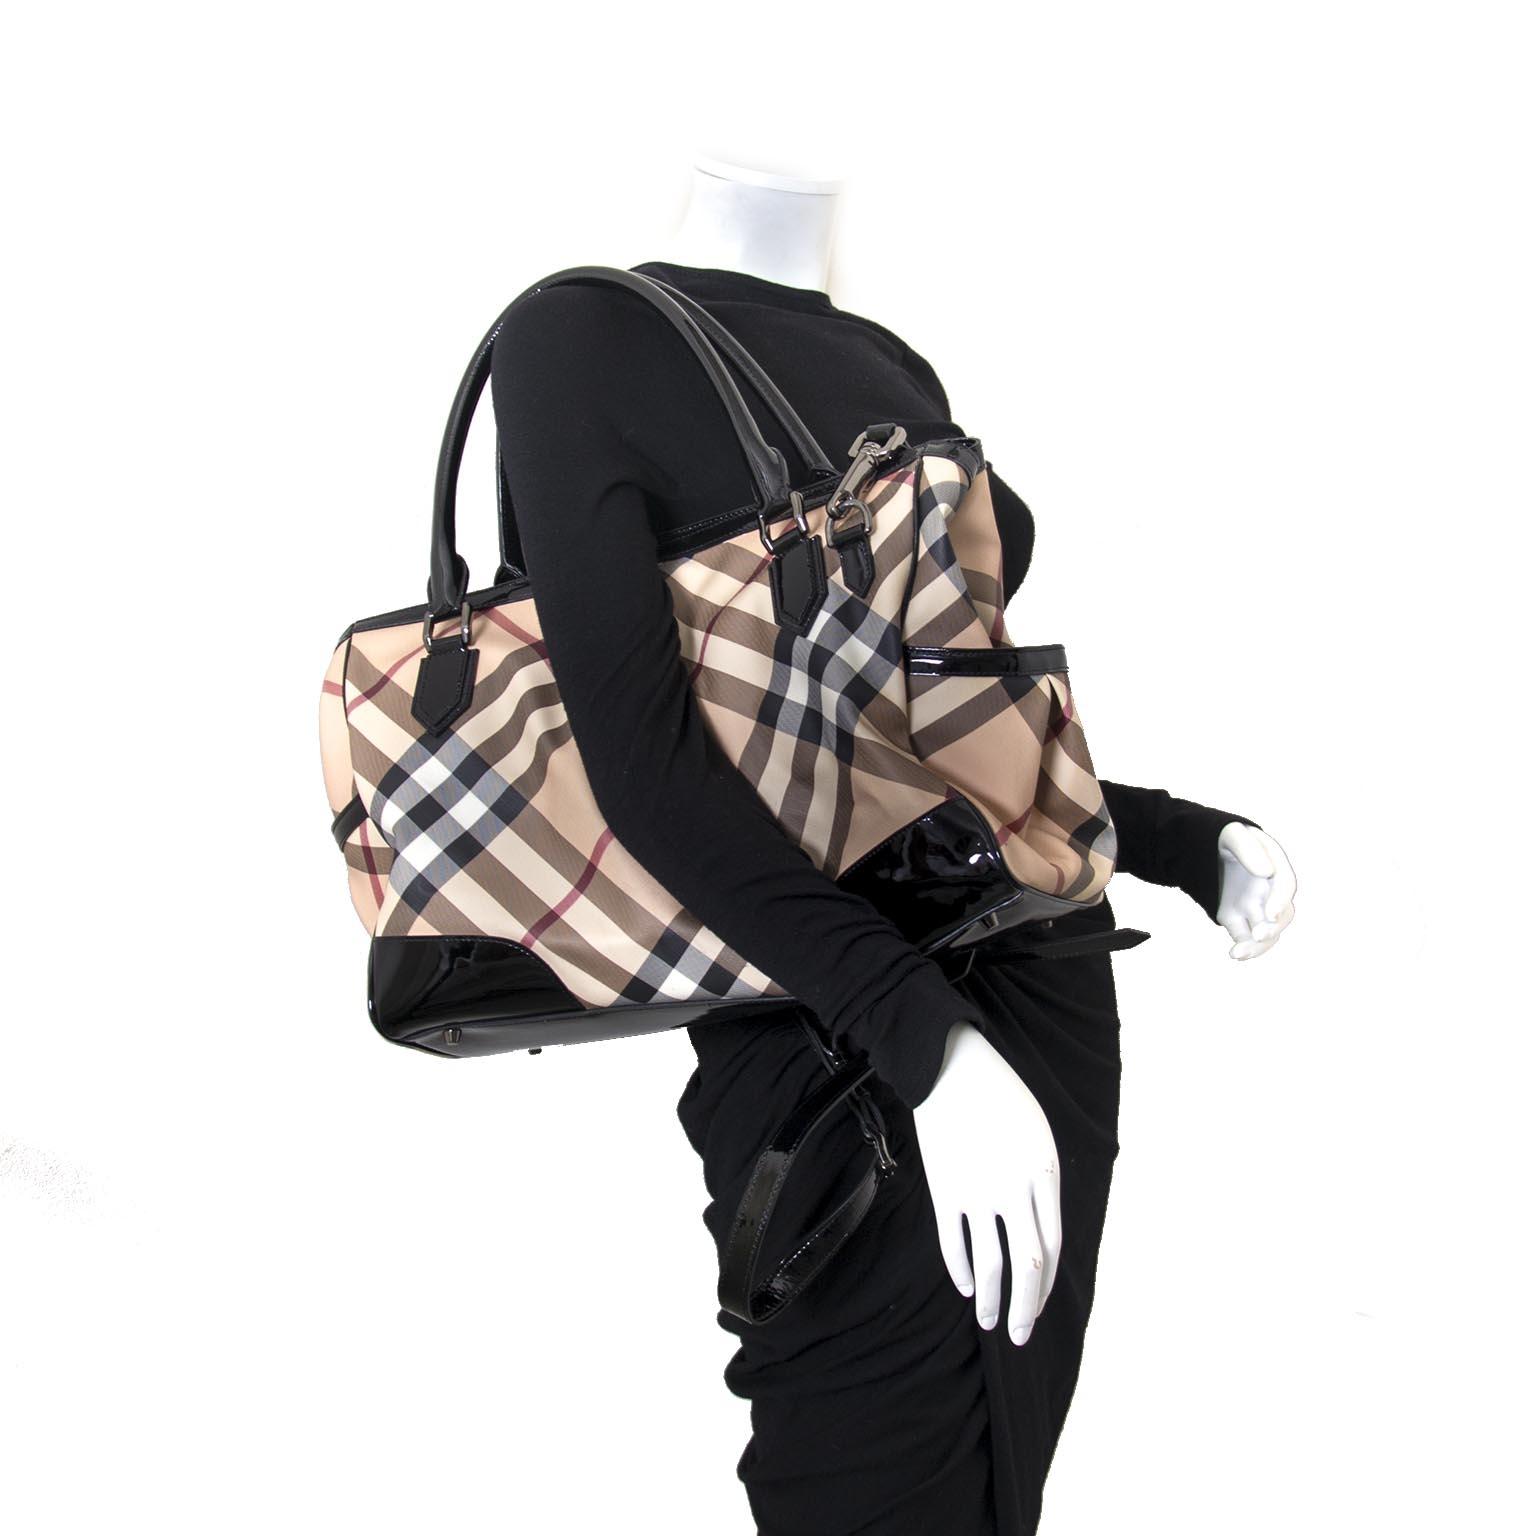 shop safe and secure online at labellov.com Burberry Nova Check Shoulder Bag